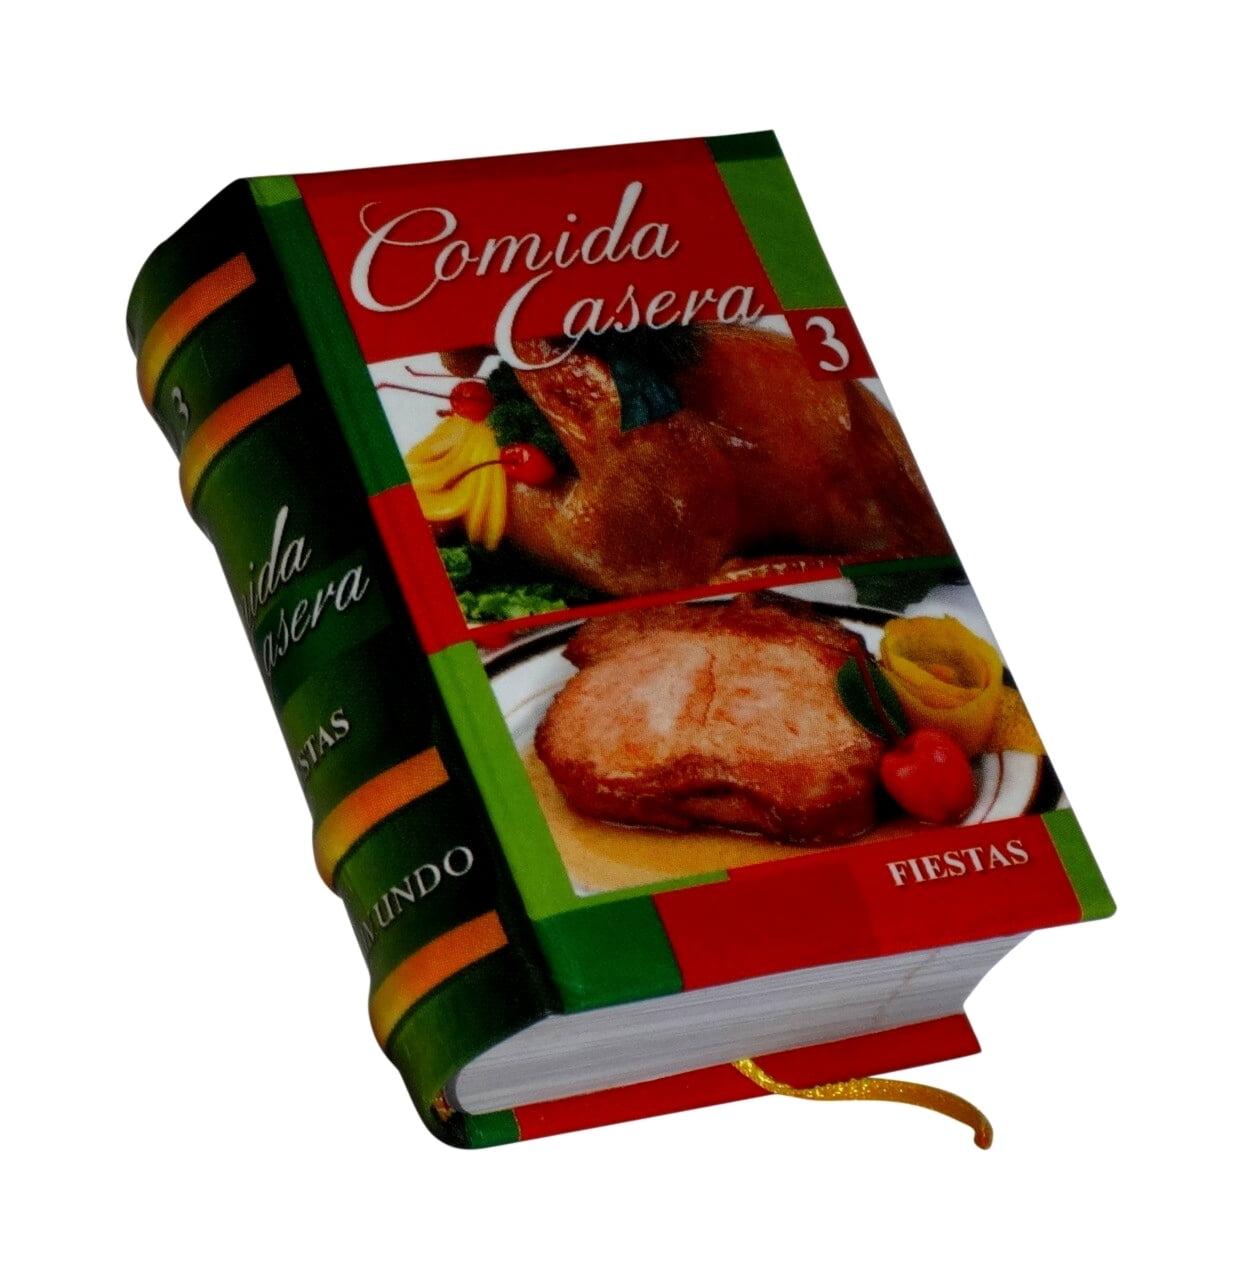 comida_casera-3-miniature-book-libro